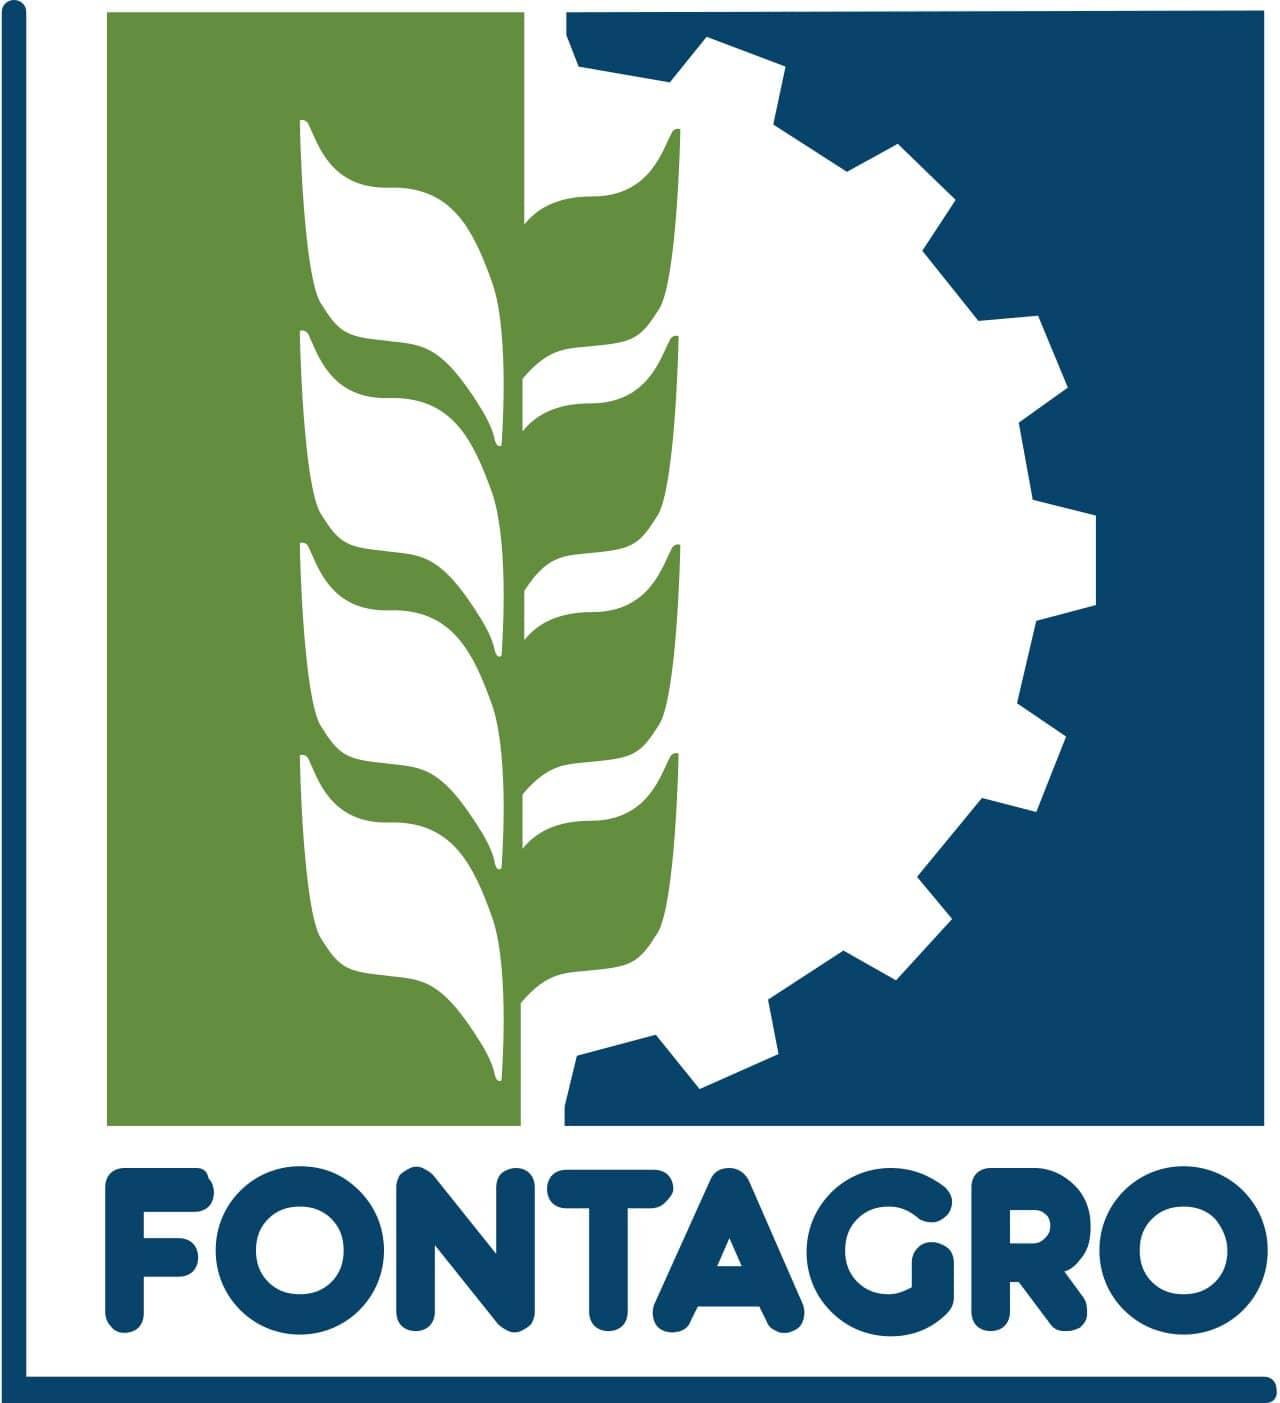 fontagro-logo-color